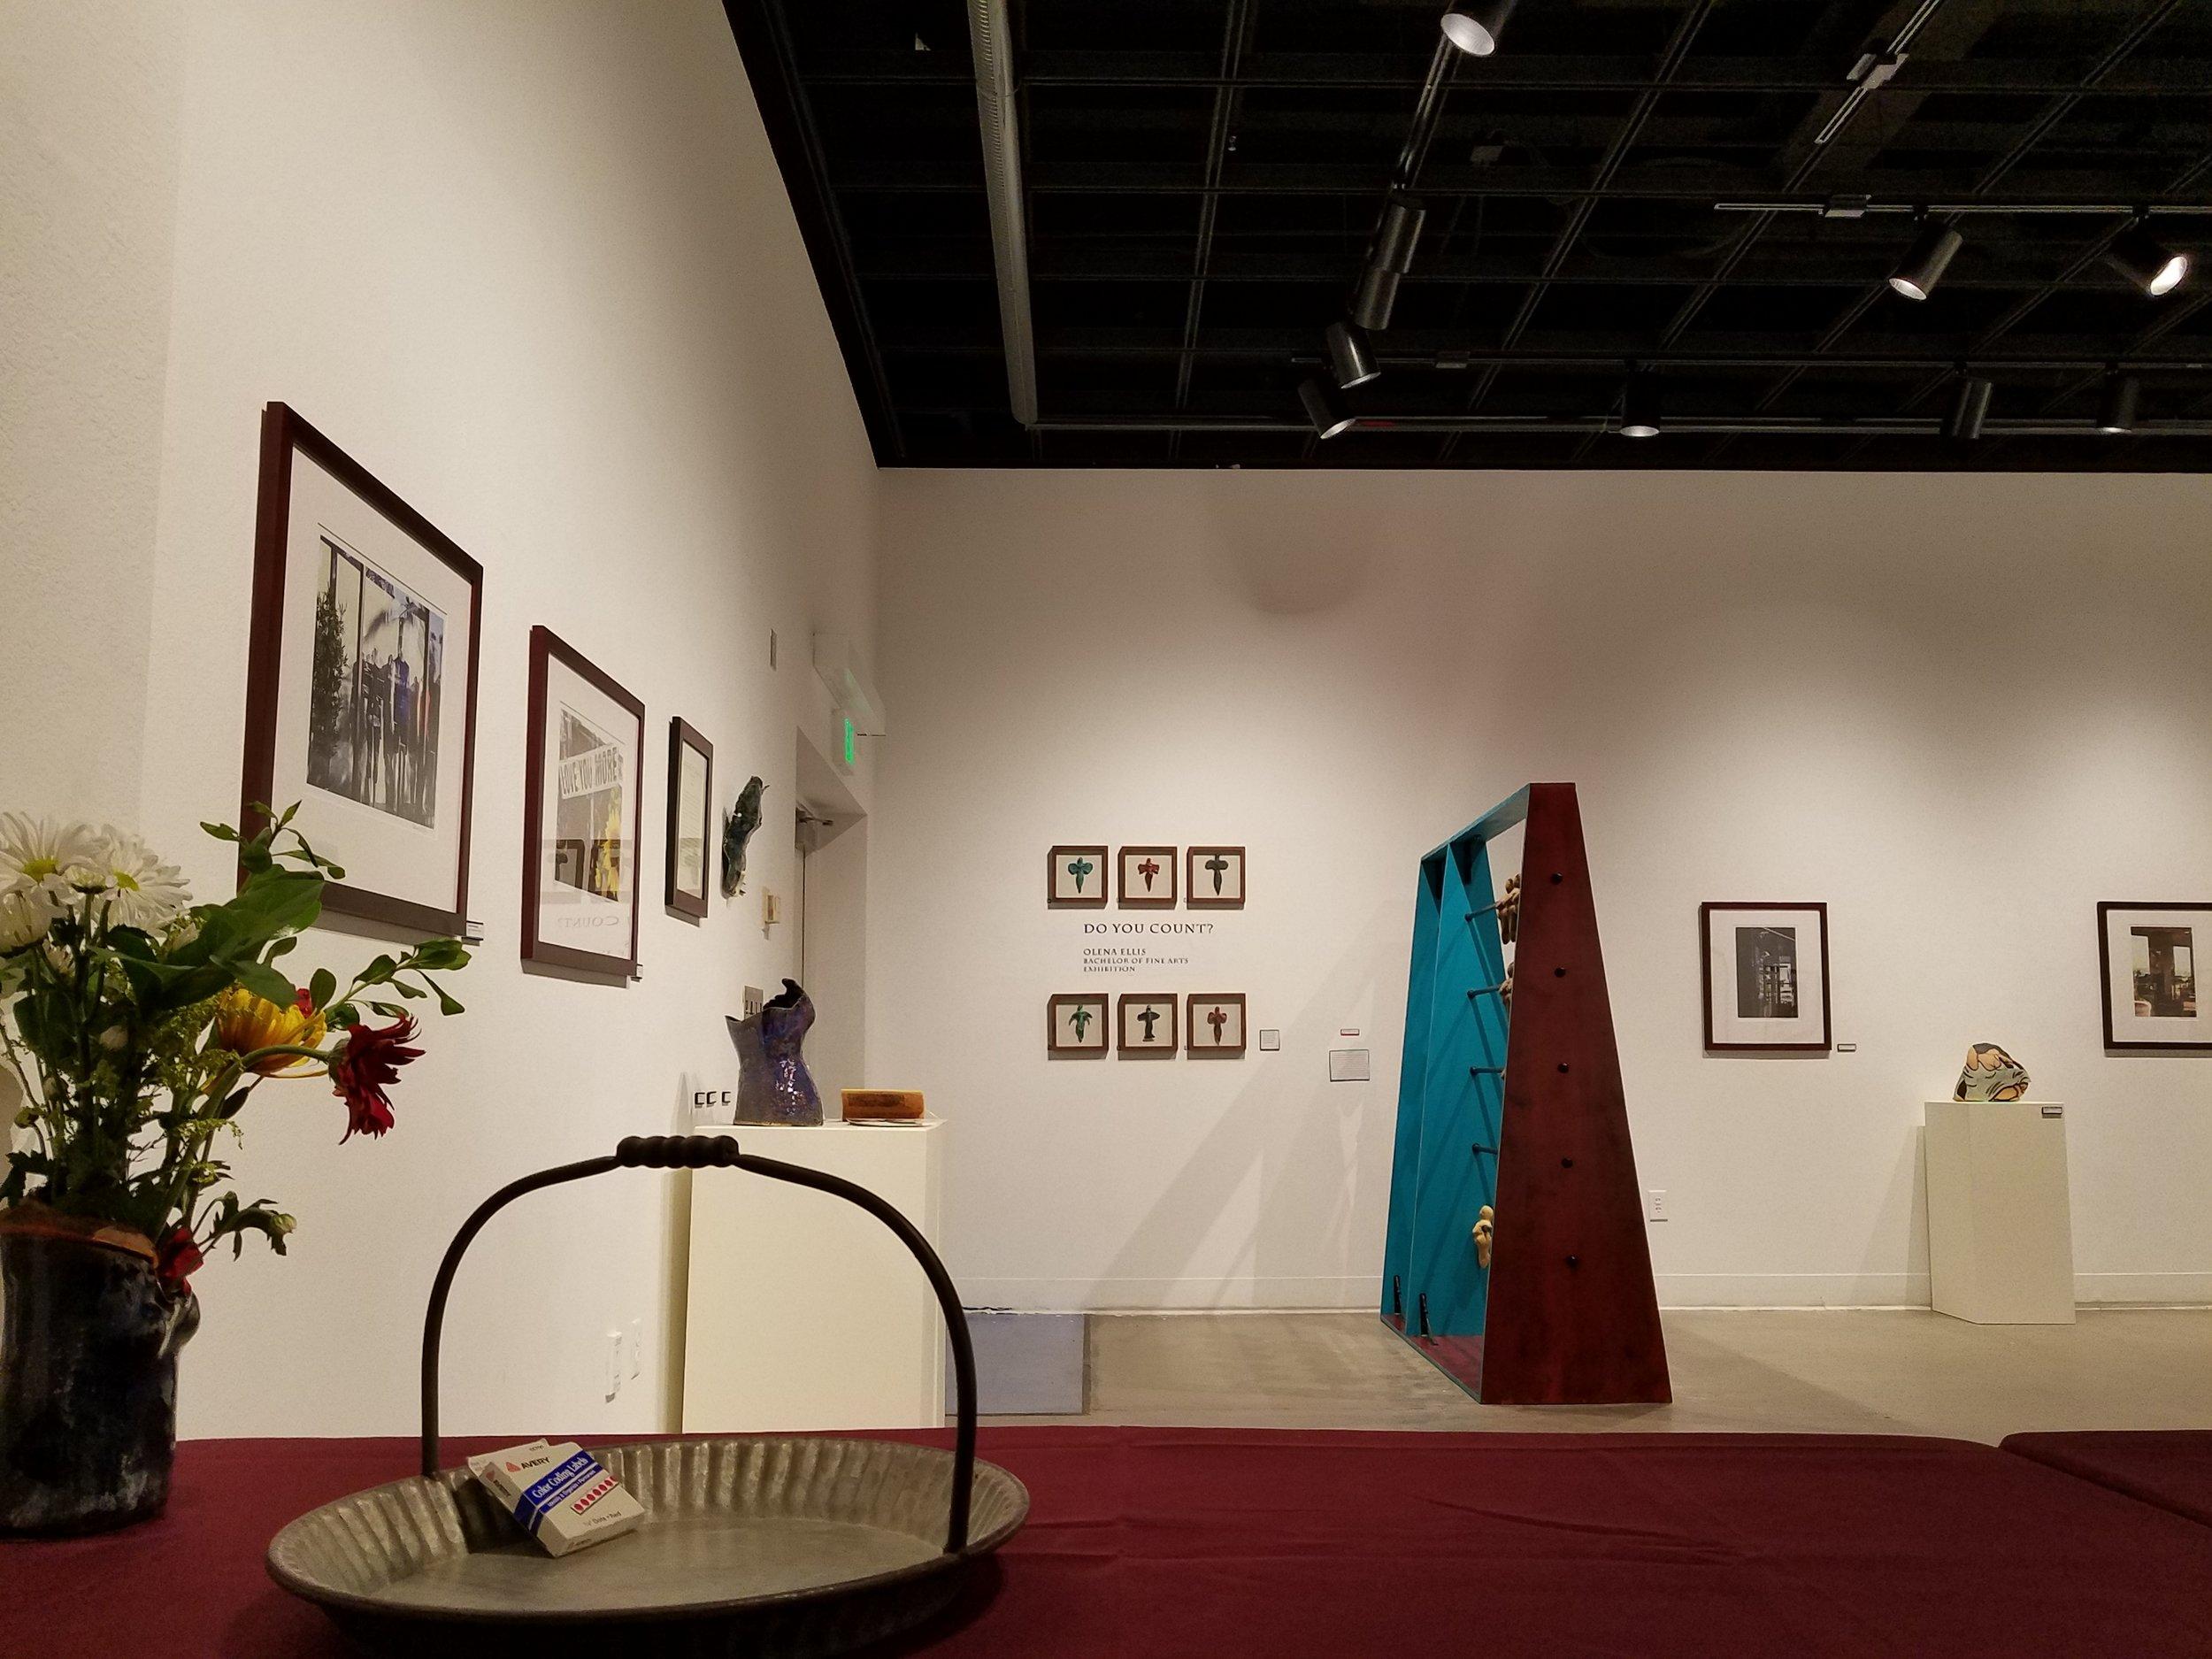 Olena A. Ellis,  Do You Count?  Exhibition, 2018